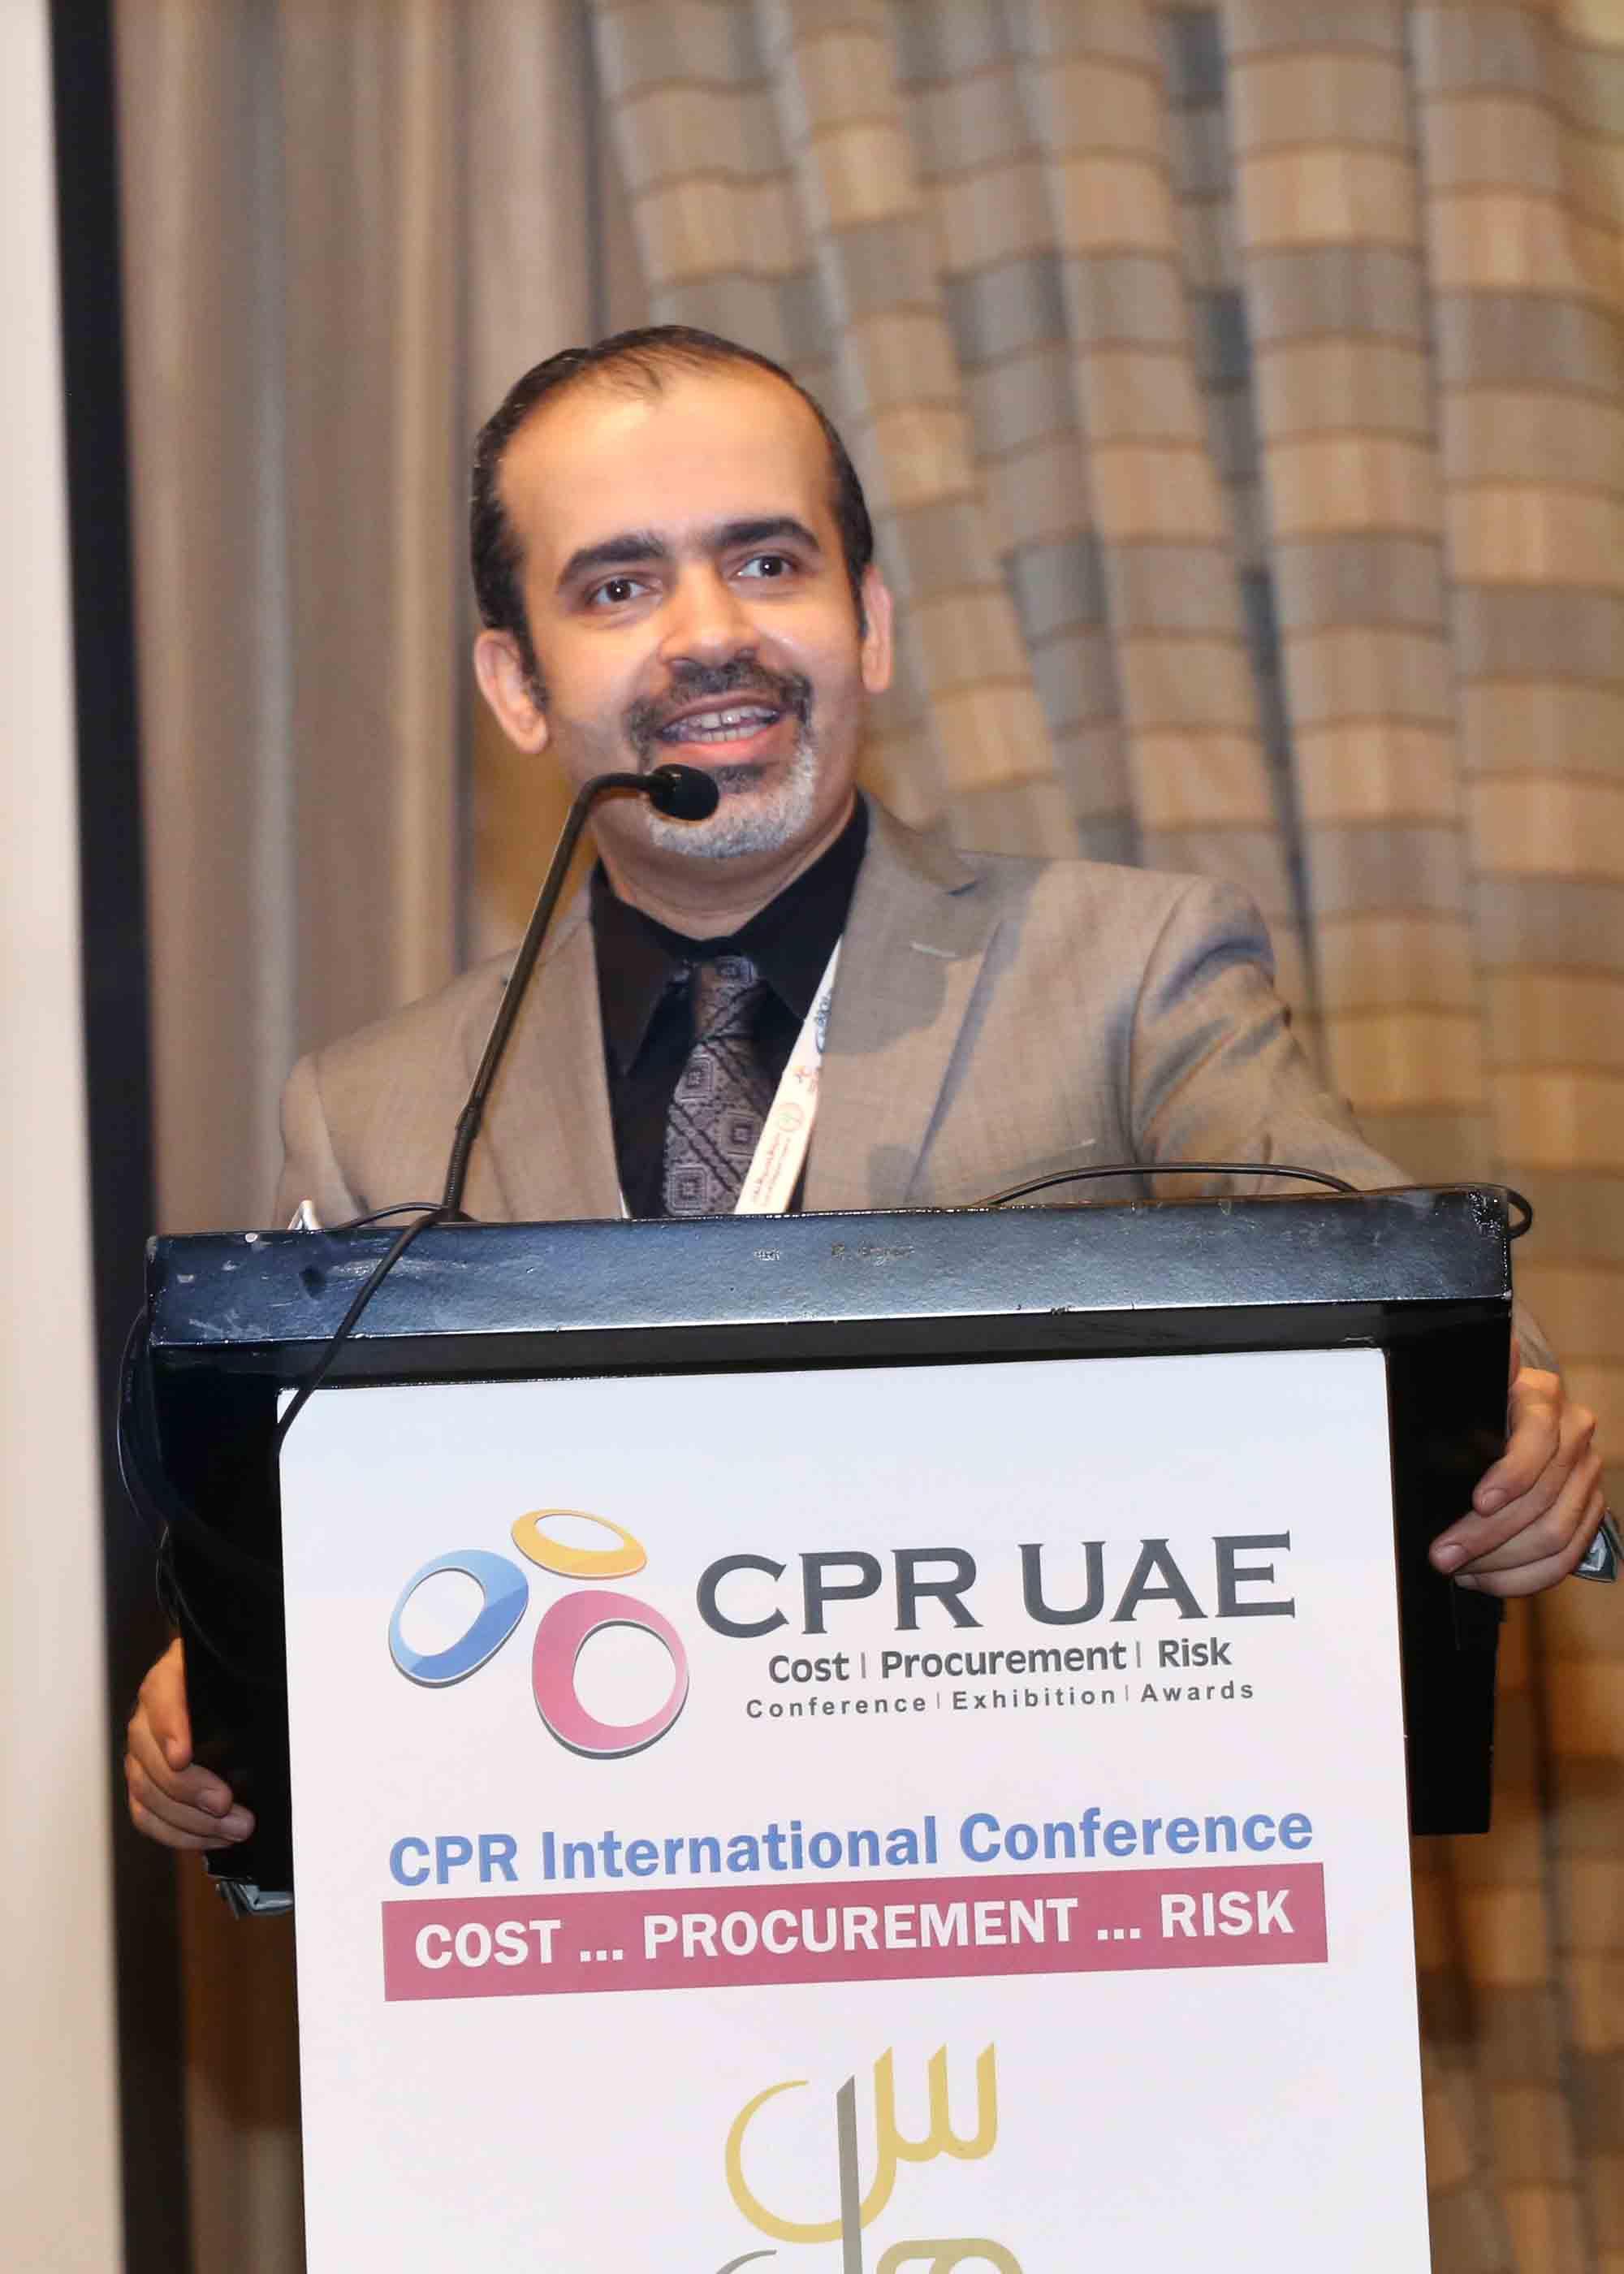 CPR UAE - International Cost, Procurement, Risk in Engineering Sector